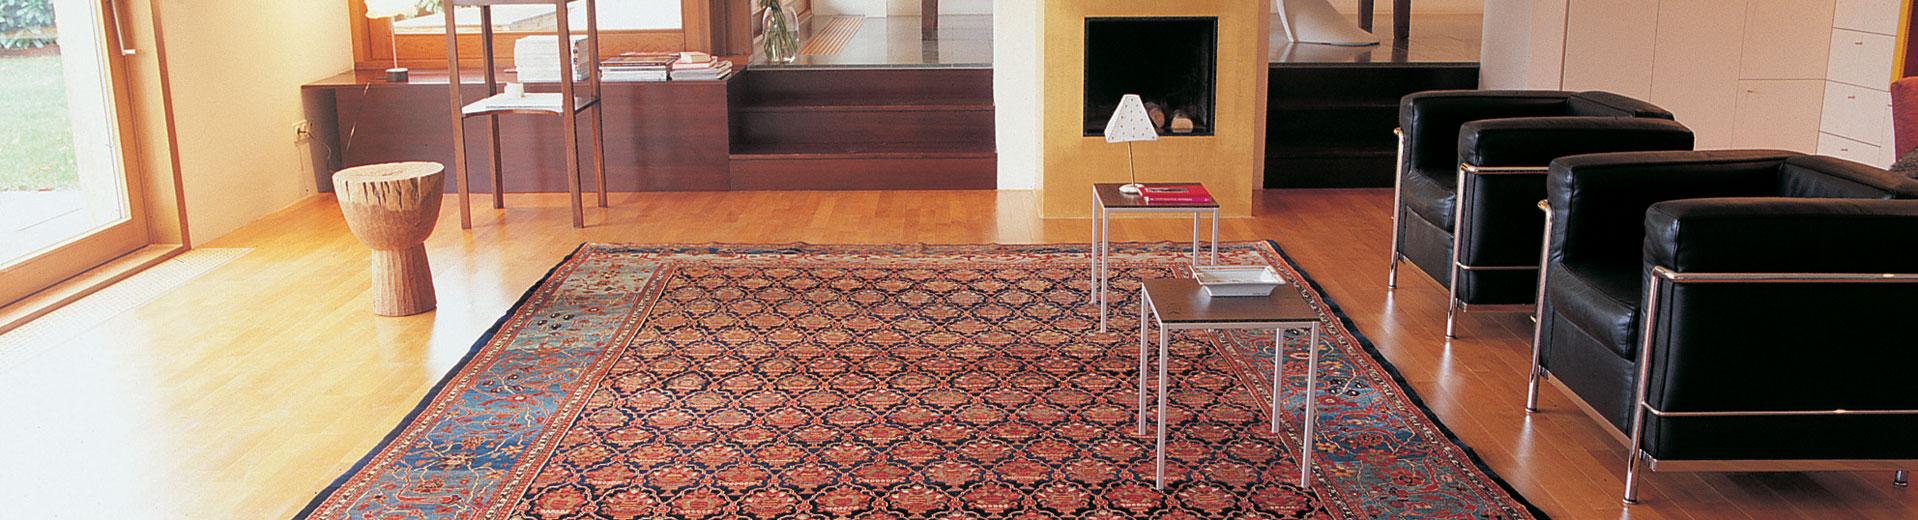 Antike Teppiche  Die Teppich Galerie